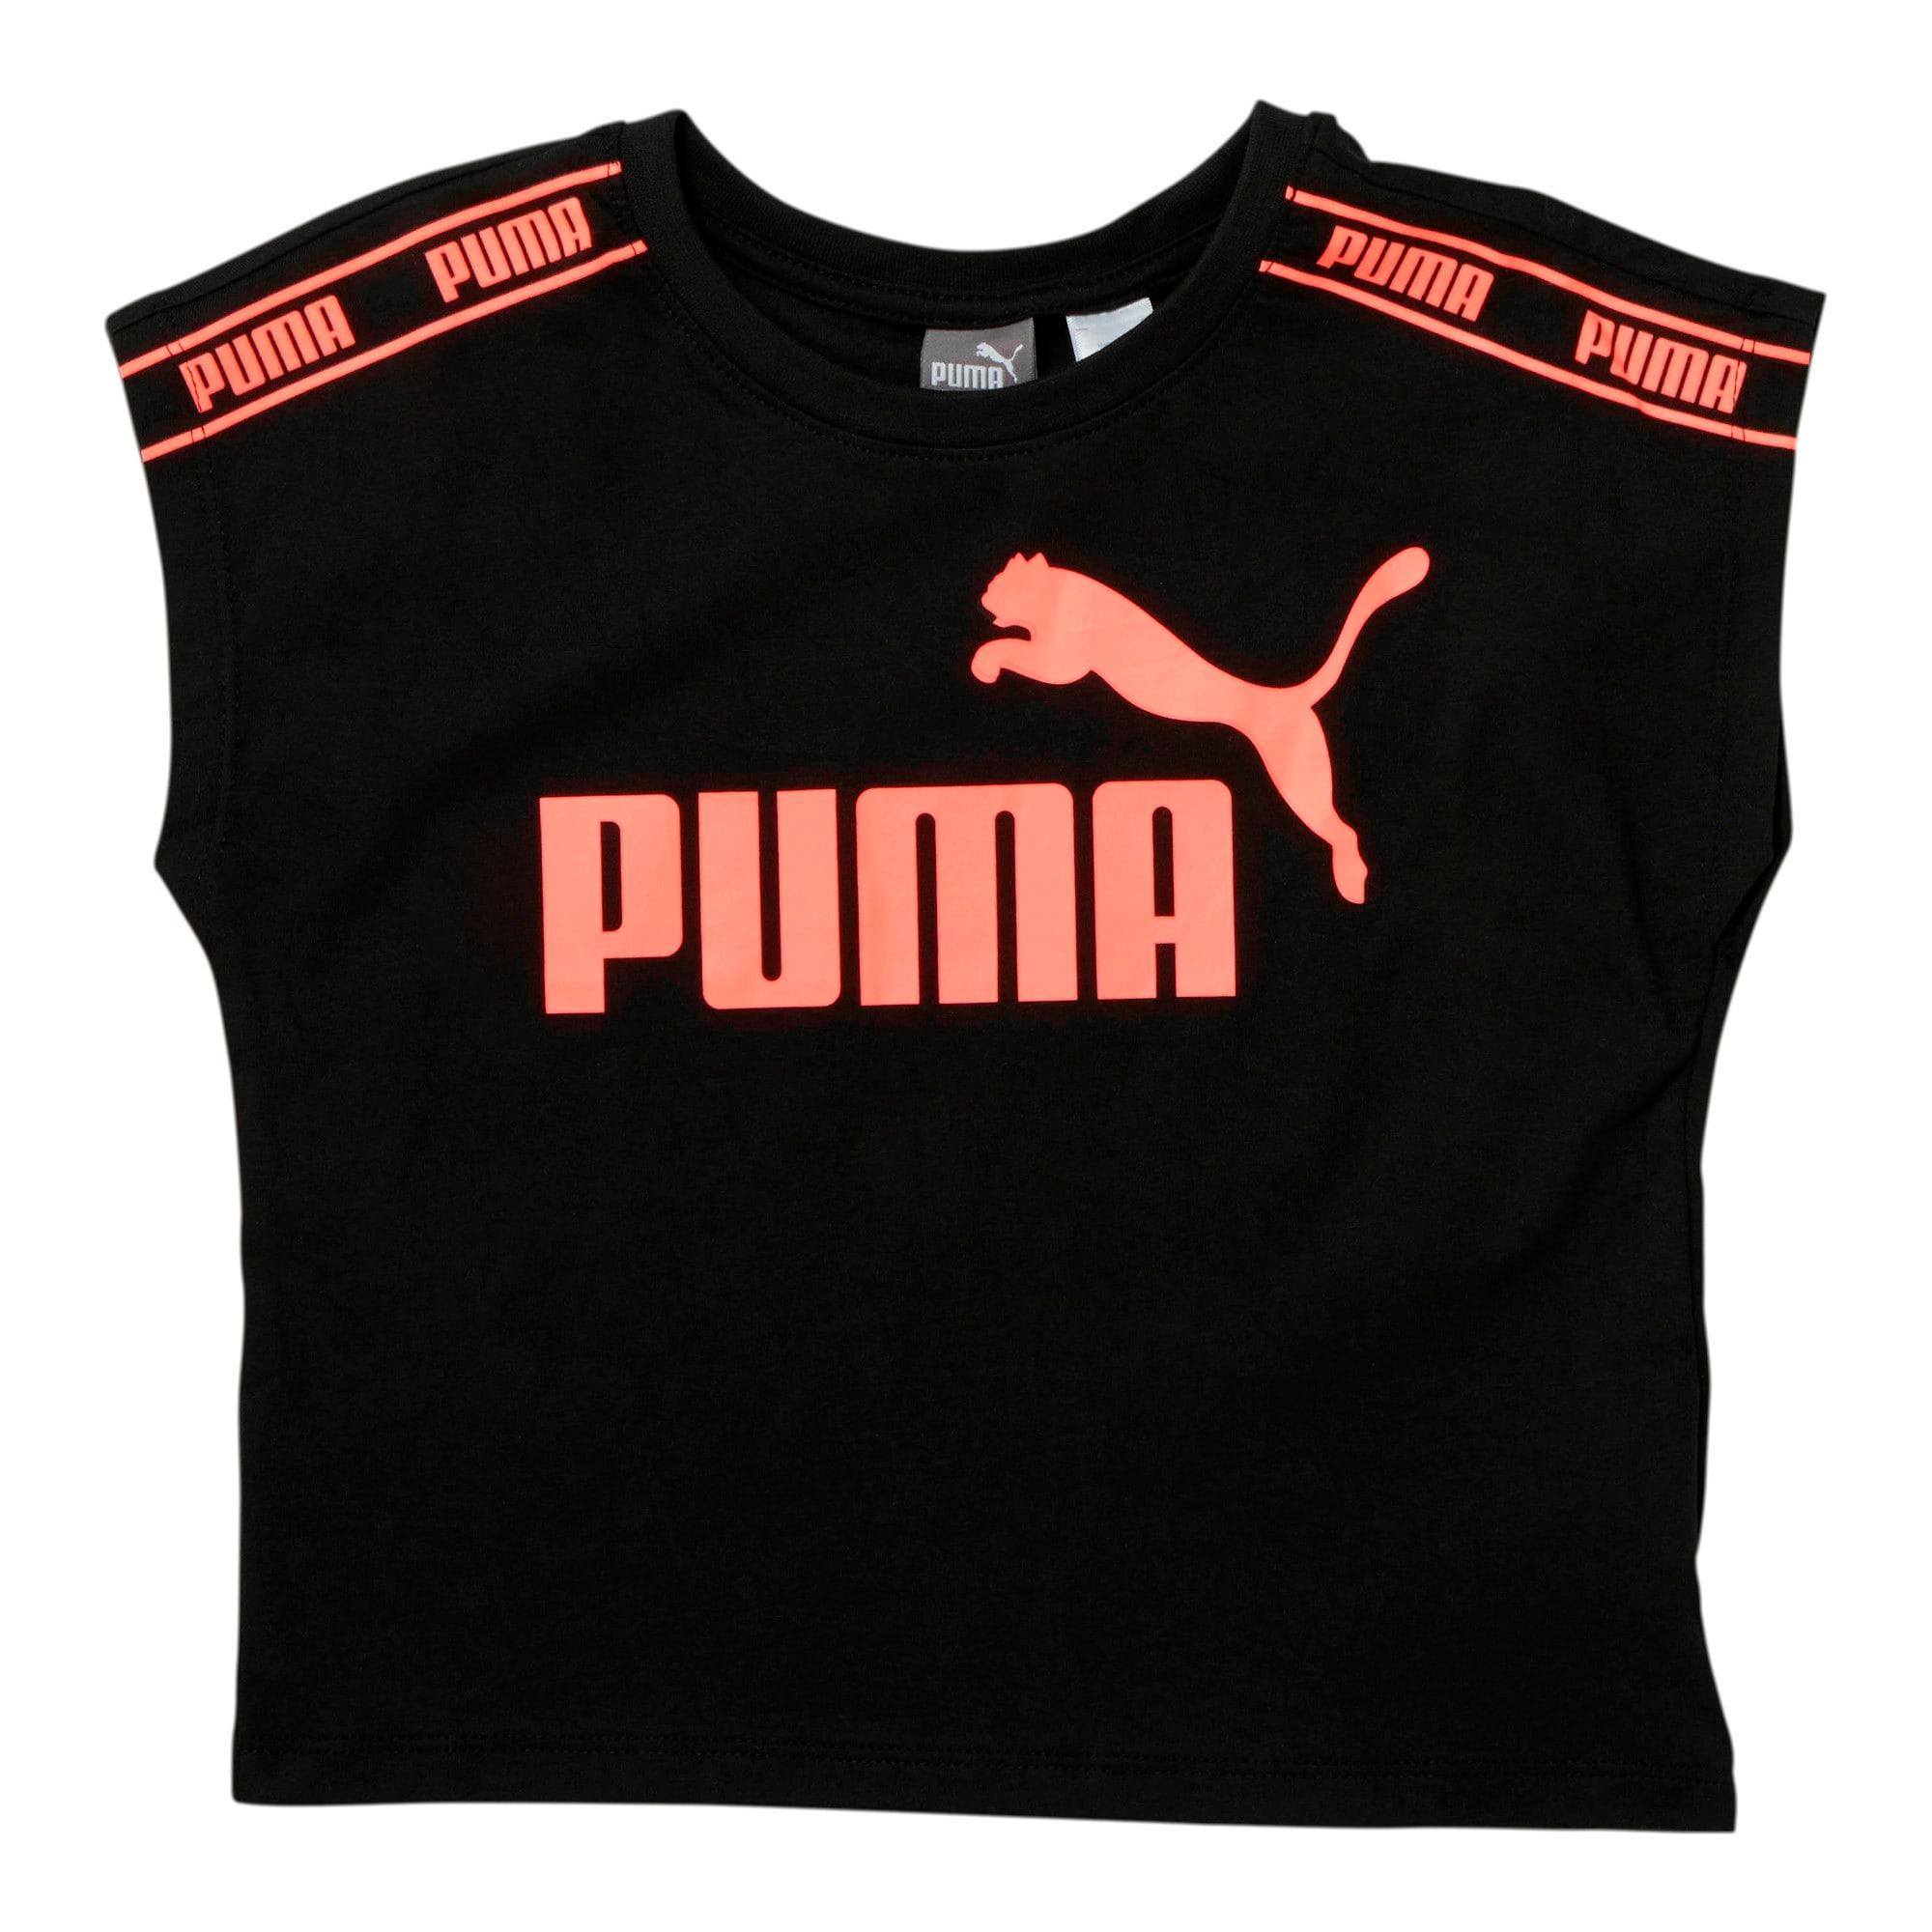 Thumbnail 1 of Amplified Pack Little Kids' Fashion Tee, PUMA BLACK, medium